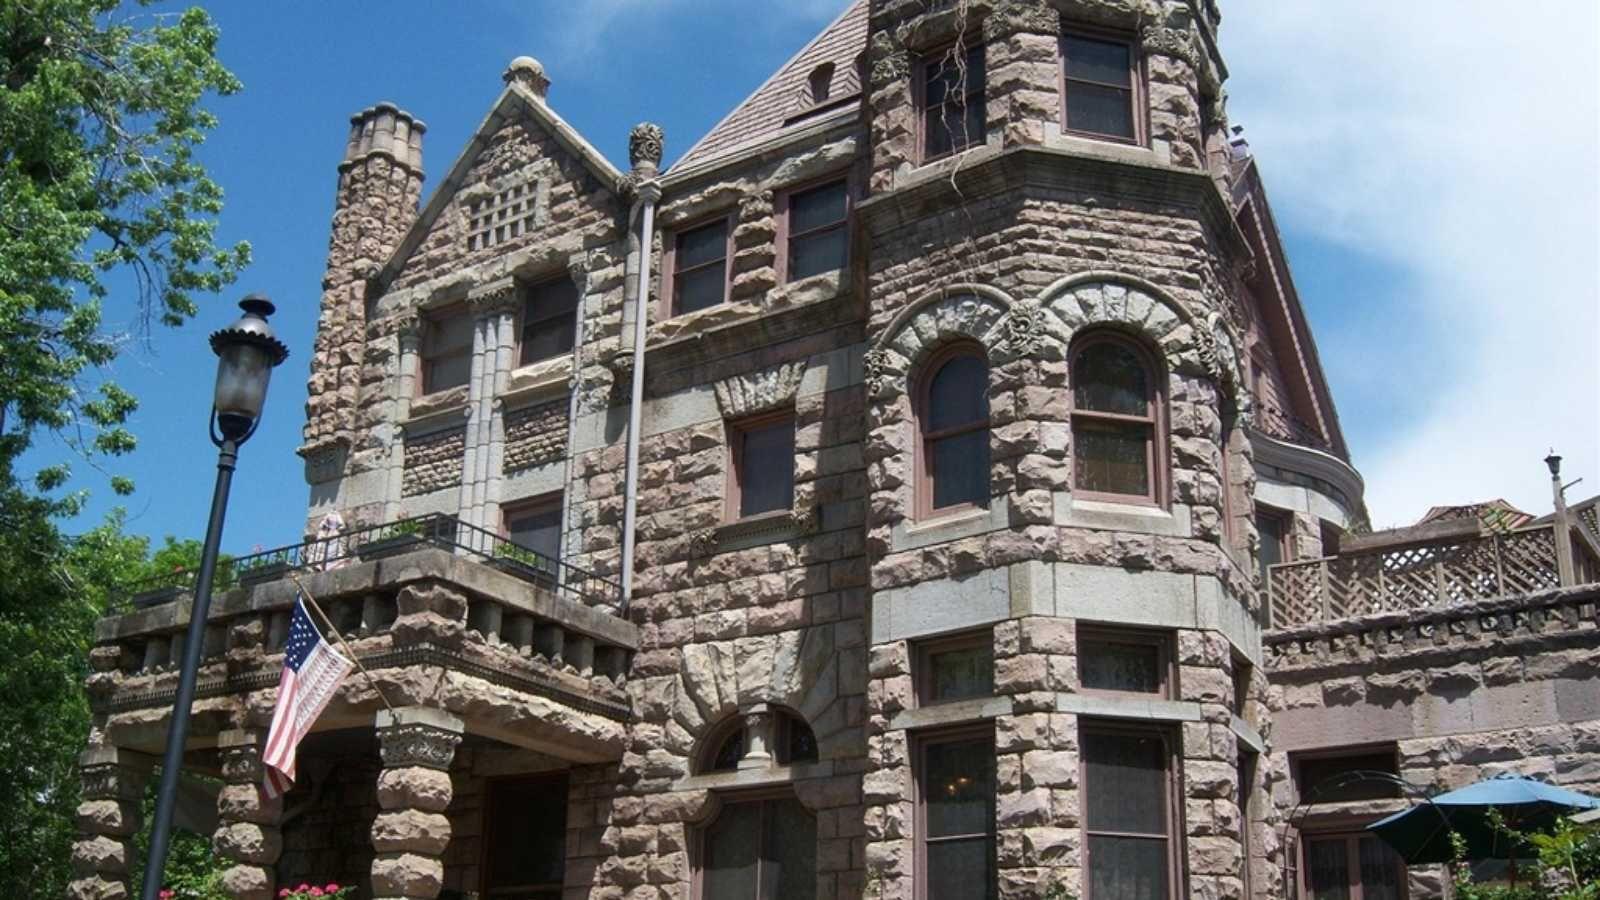 Castle Marne Bed and Breakfast Denver USA Castle